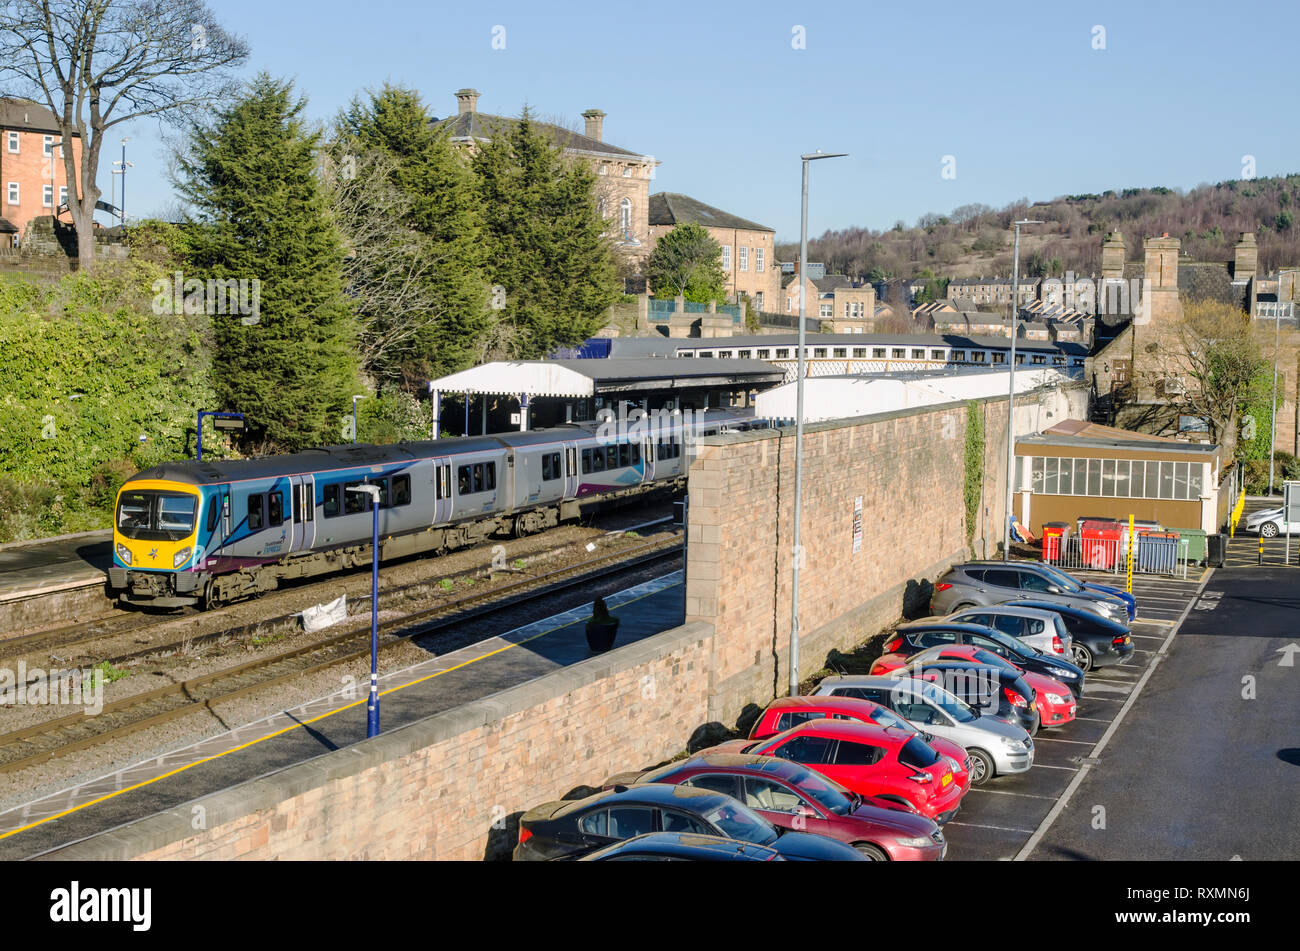 Transpennine Train at Dewsbury station. - Stock Image